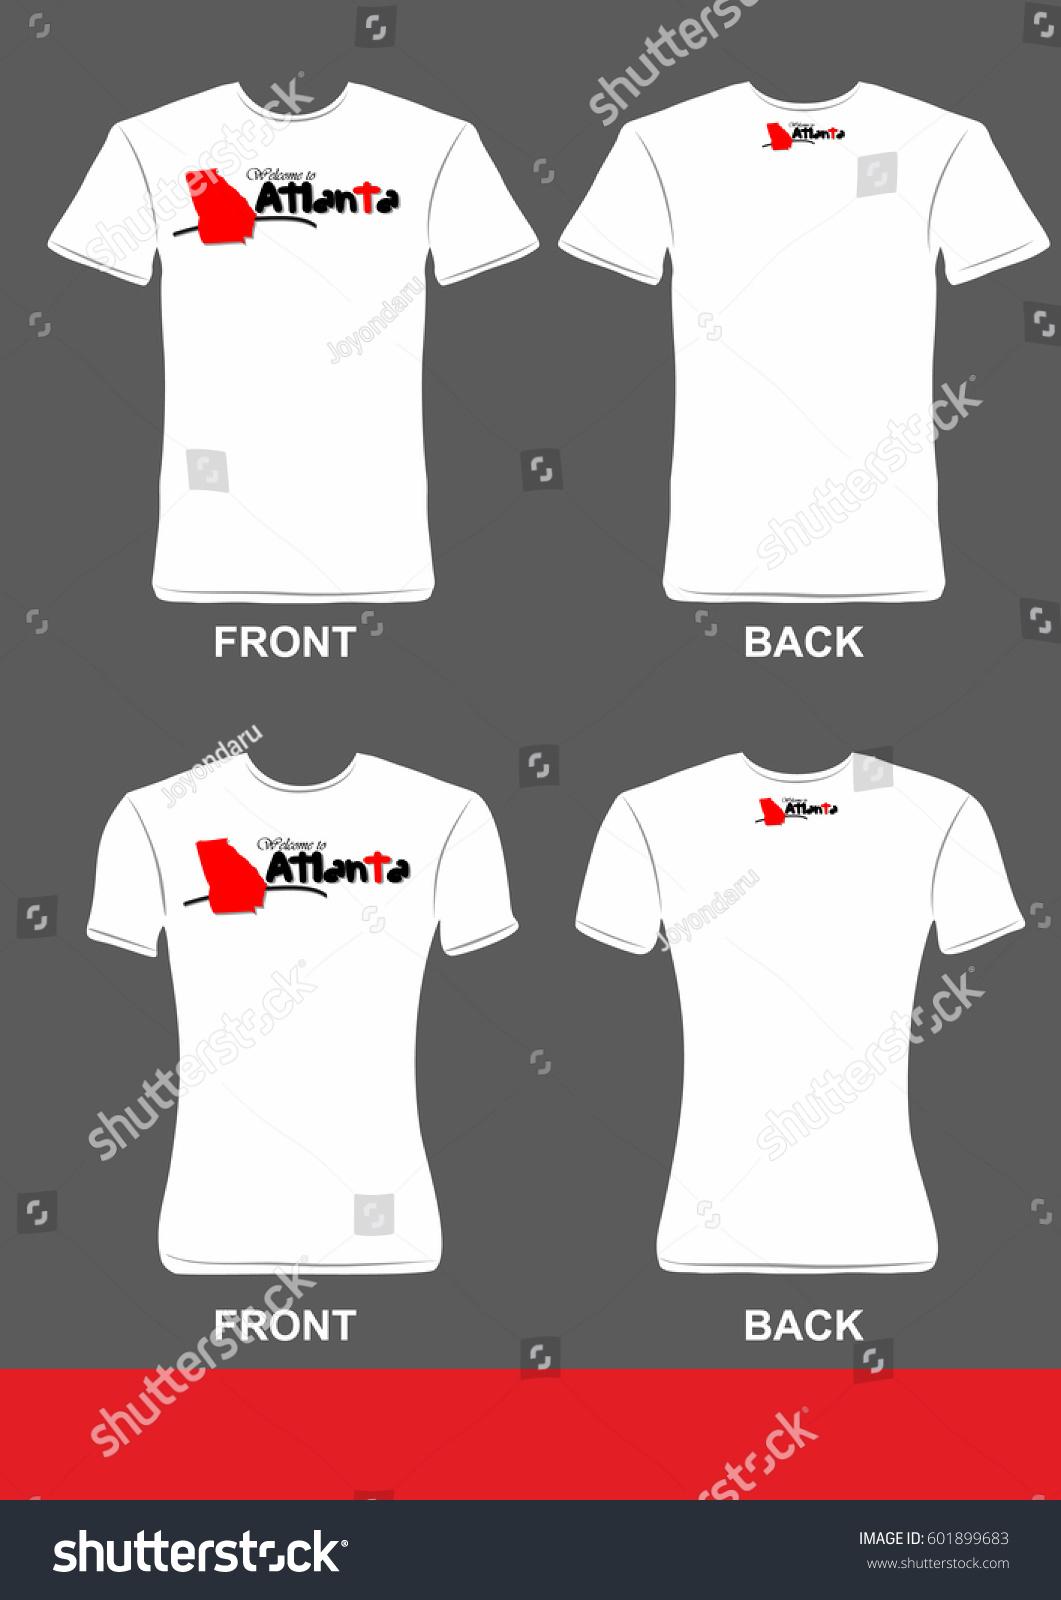 Simple T Shirt Design Welcome Atlanta Stock Vector Royalty Free